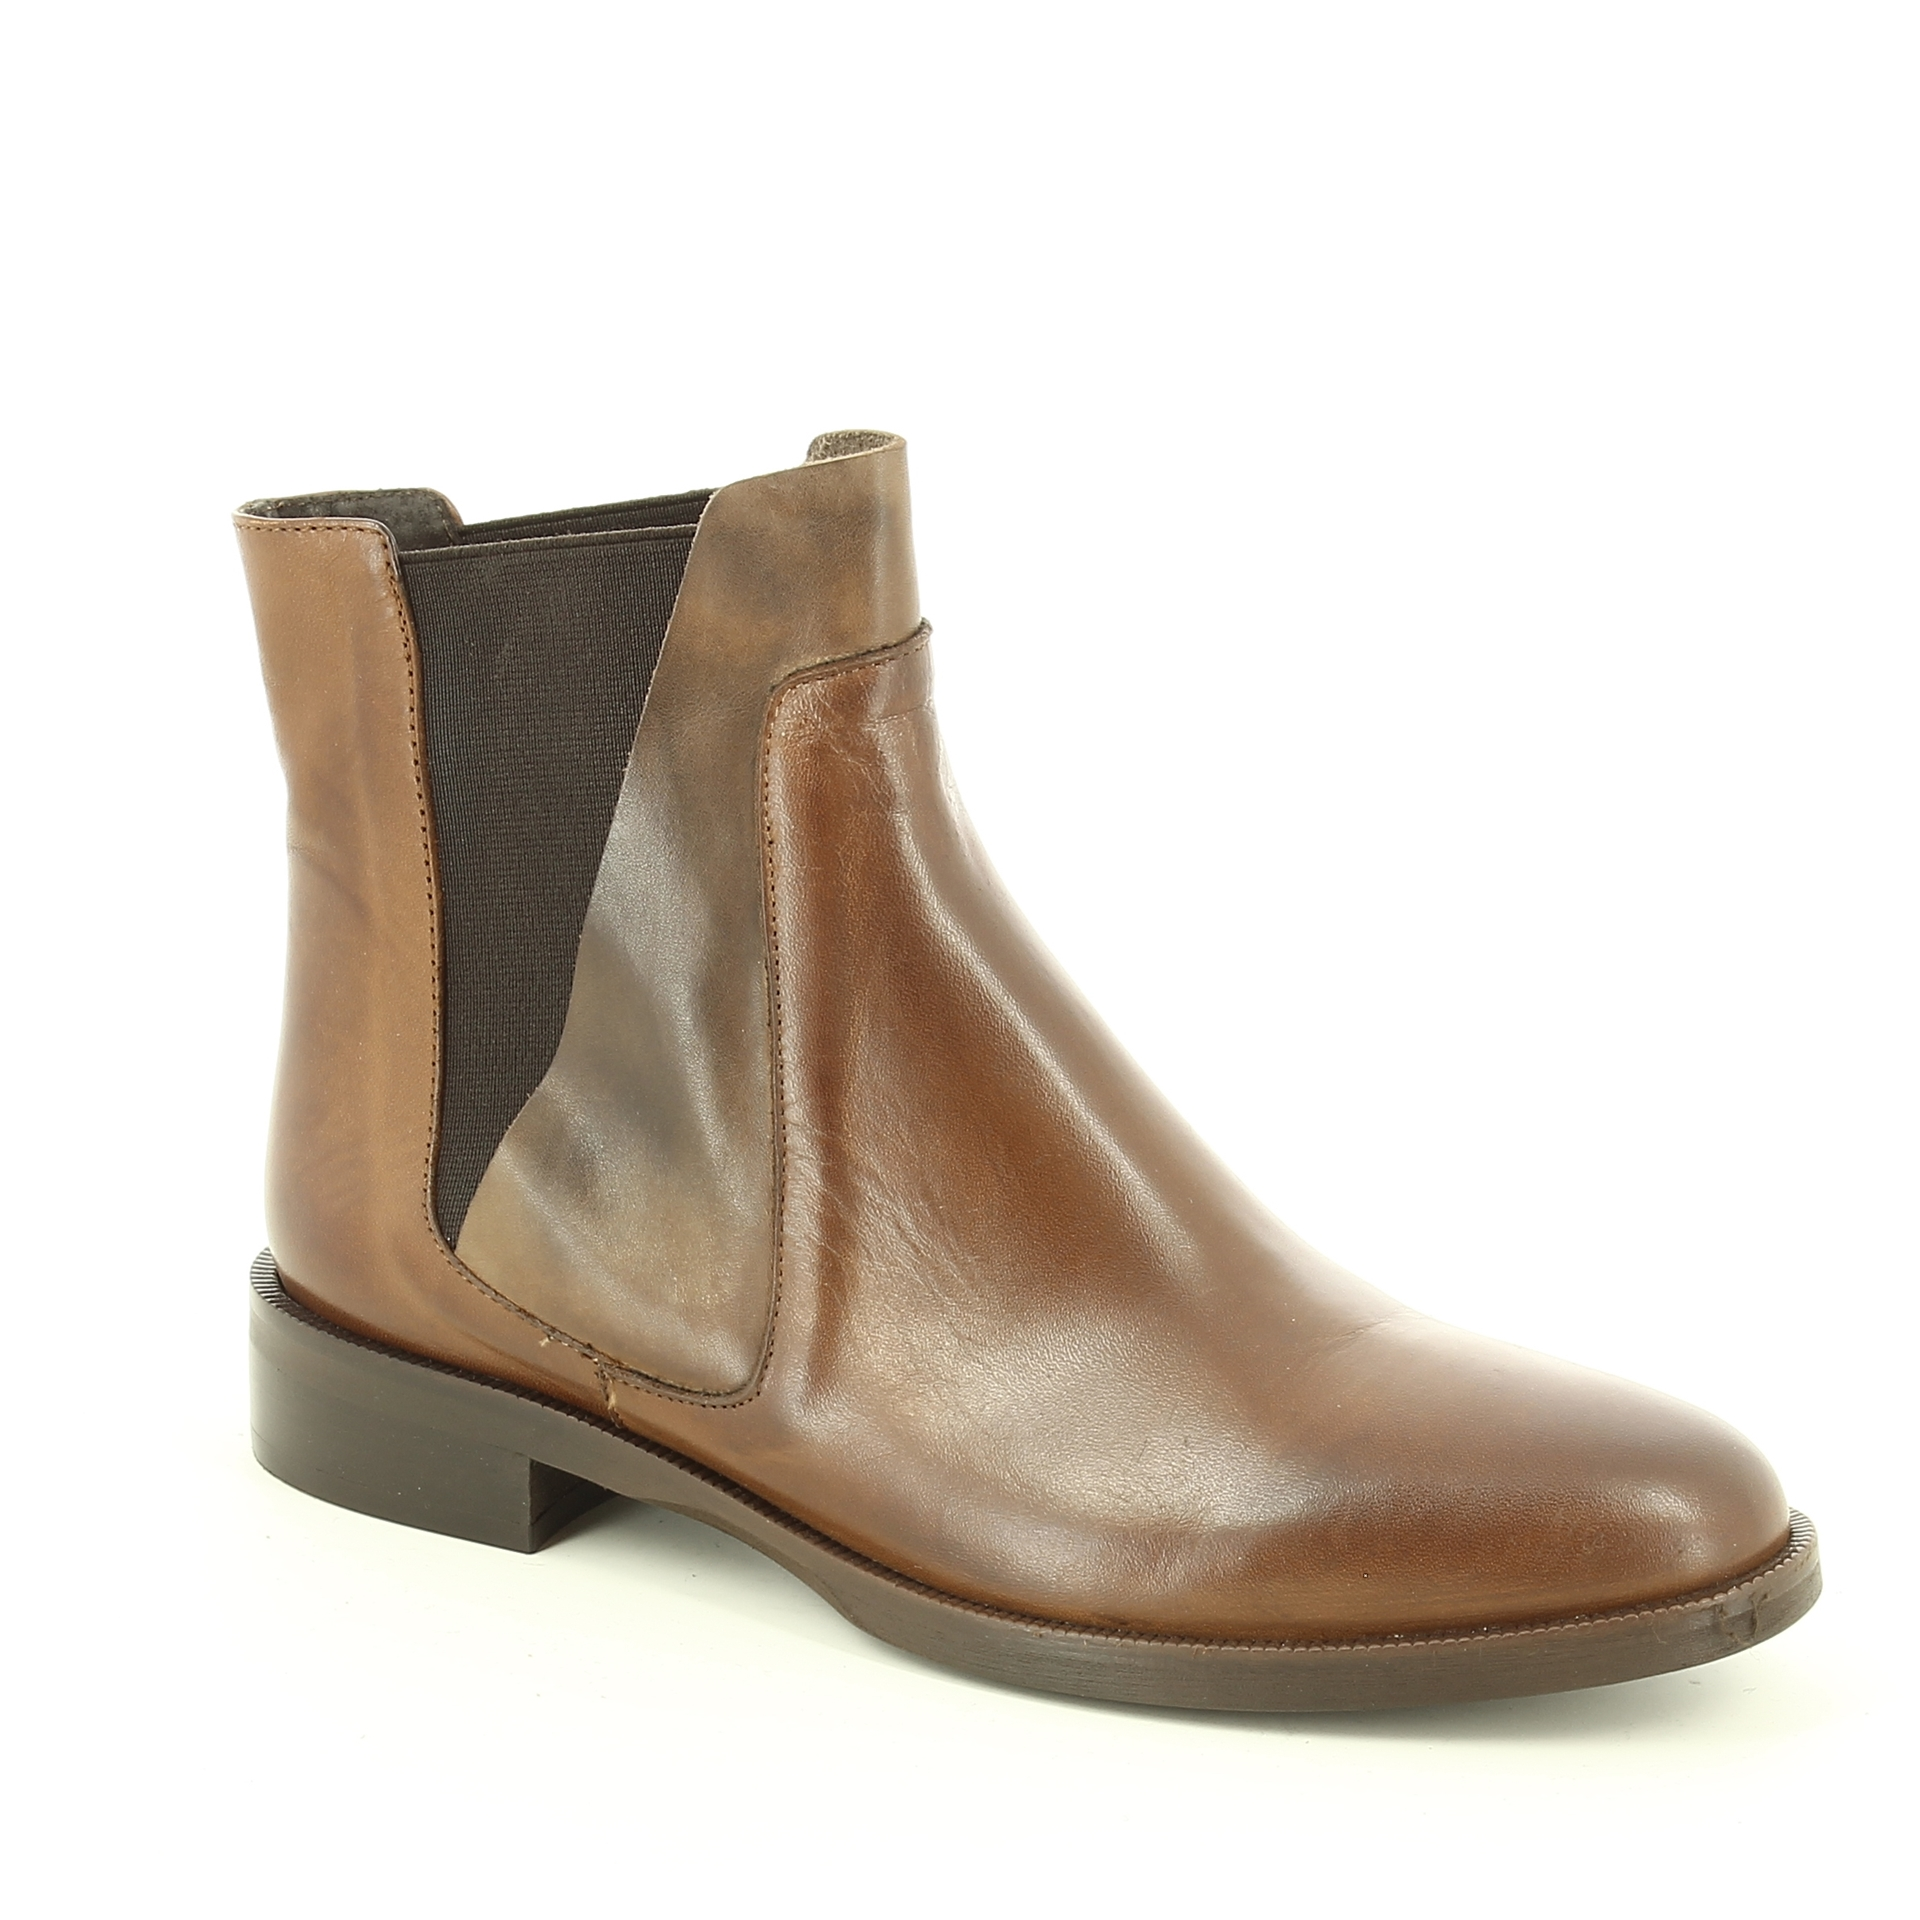 Bercolini Kényelmes cipők Gianni Crasto, női, boka, bőr